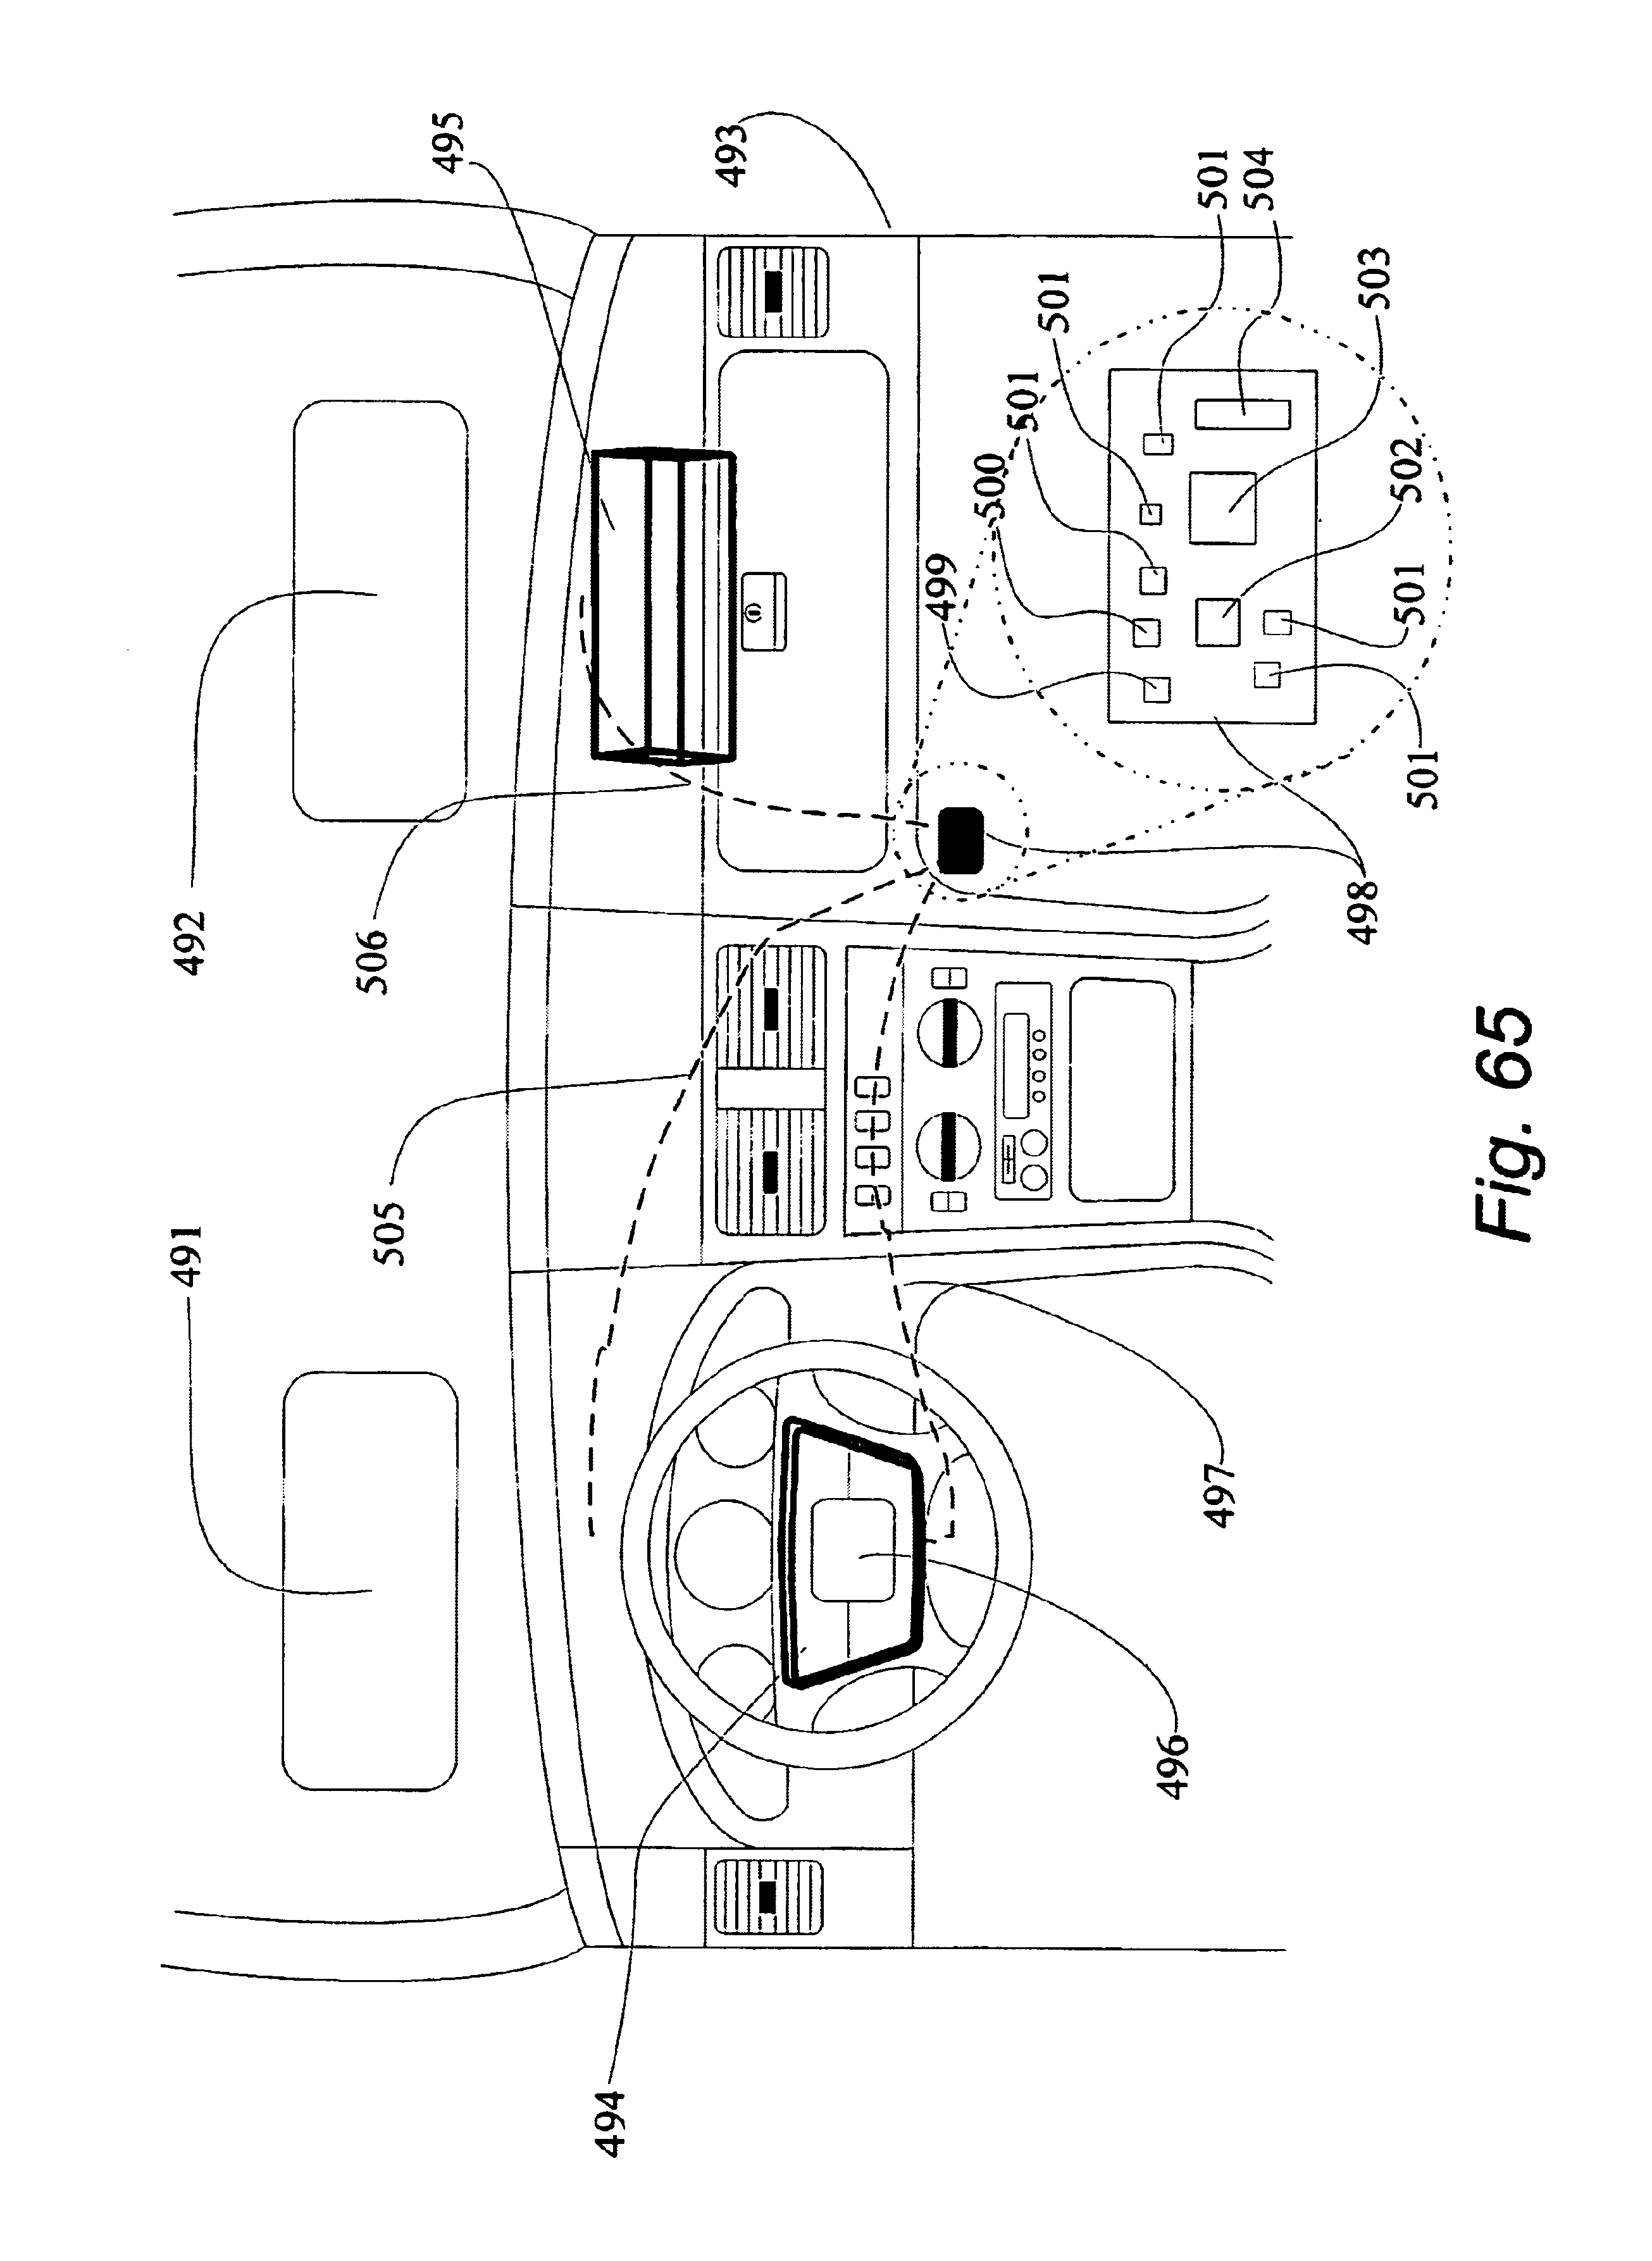 patent us 6 988 026 b2 Mod Wiring Diagram patent images